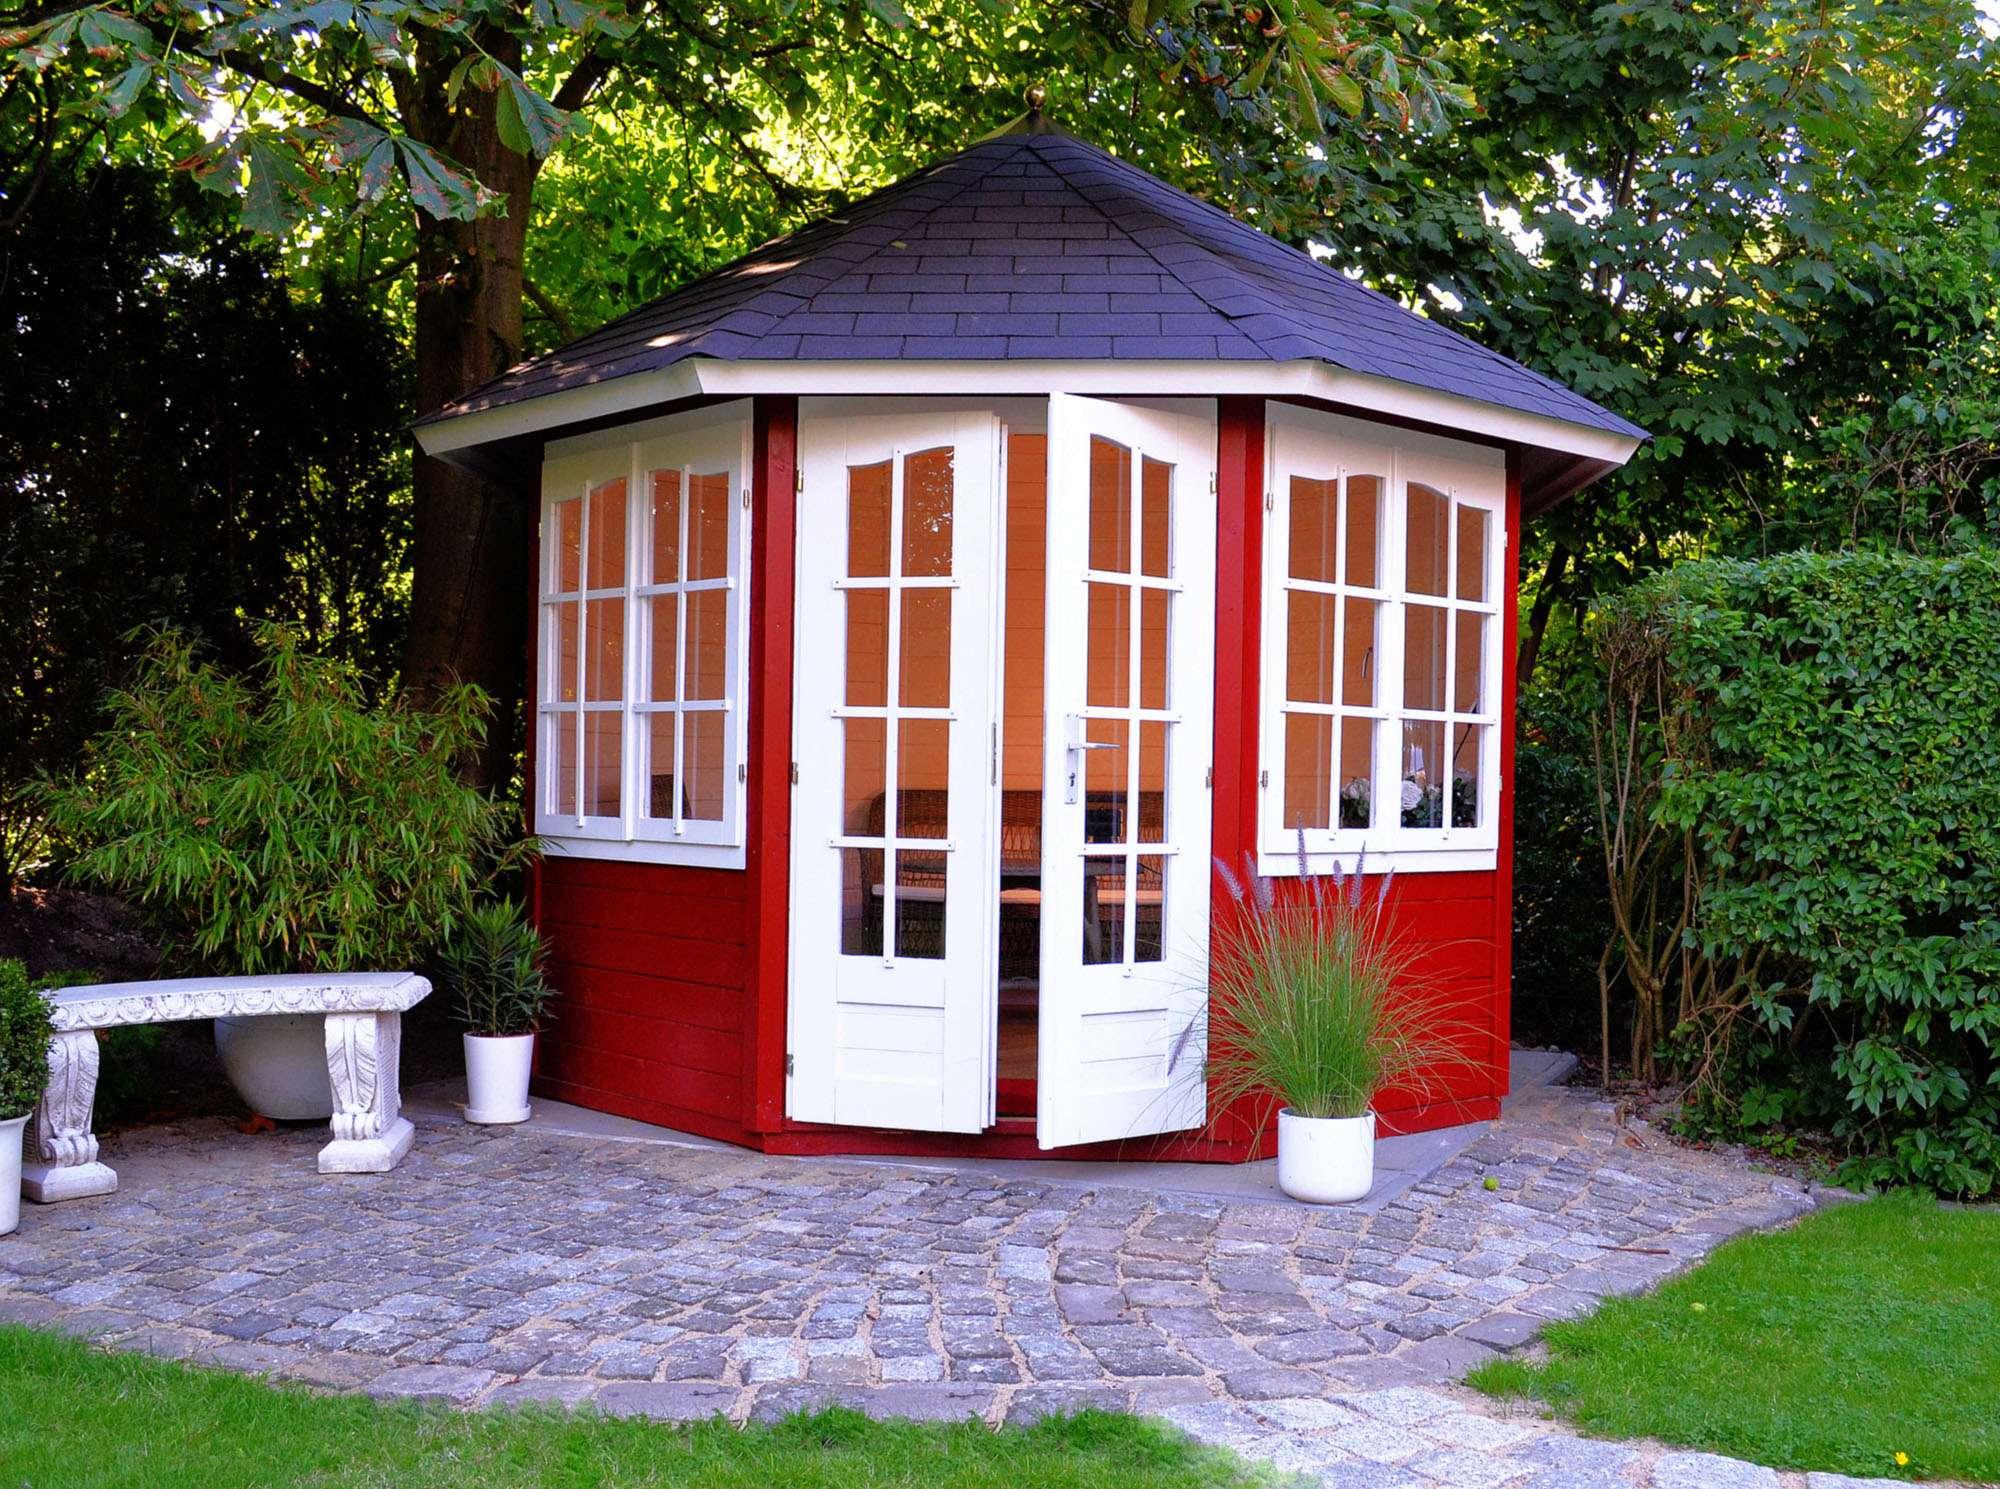 Palmako Gartenpavillon Veronica 4 6,7 m² PAP28 2929 1